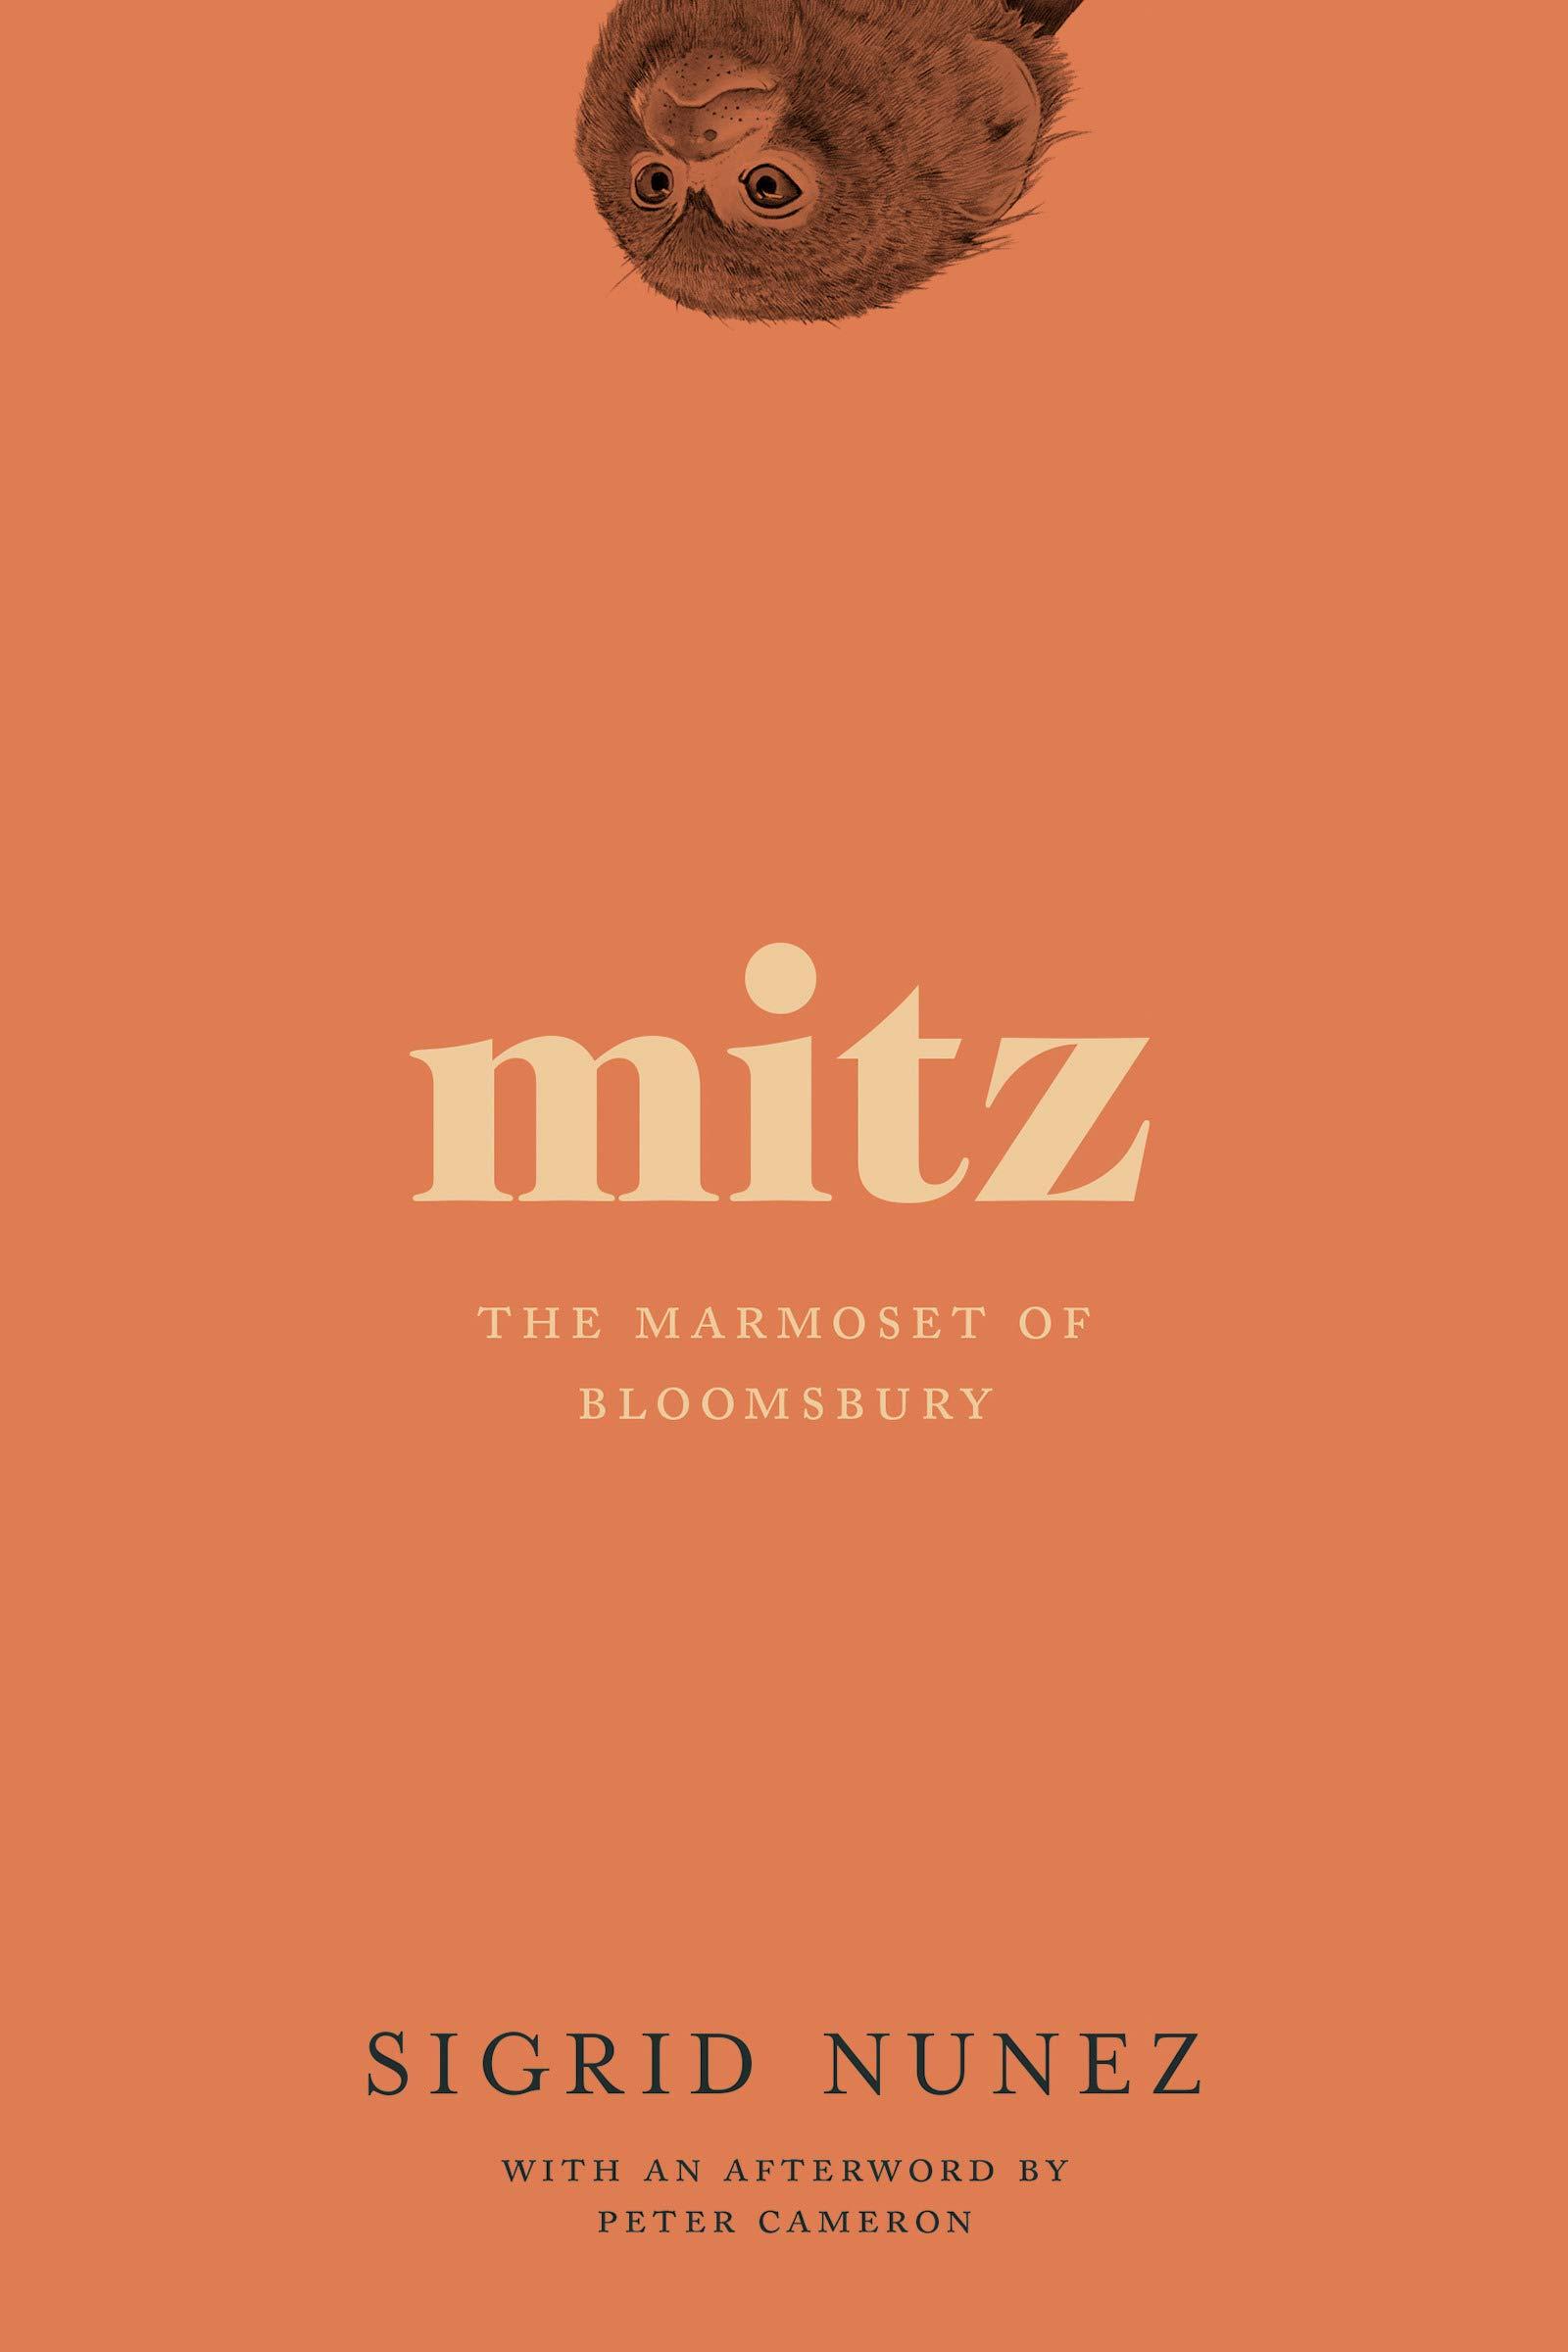 Mitz The Marmoset Of Bloomsbury By Sigrid Nunez